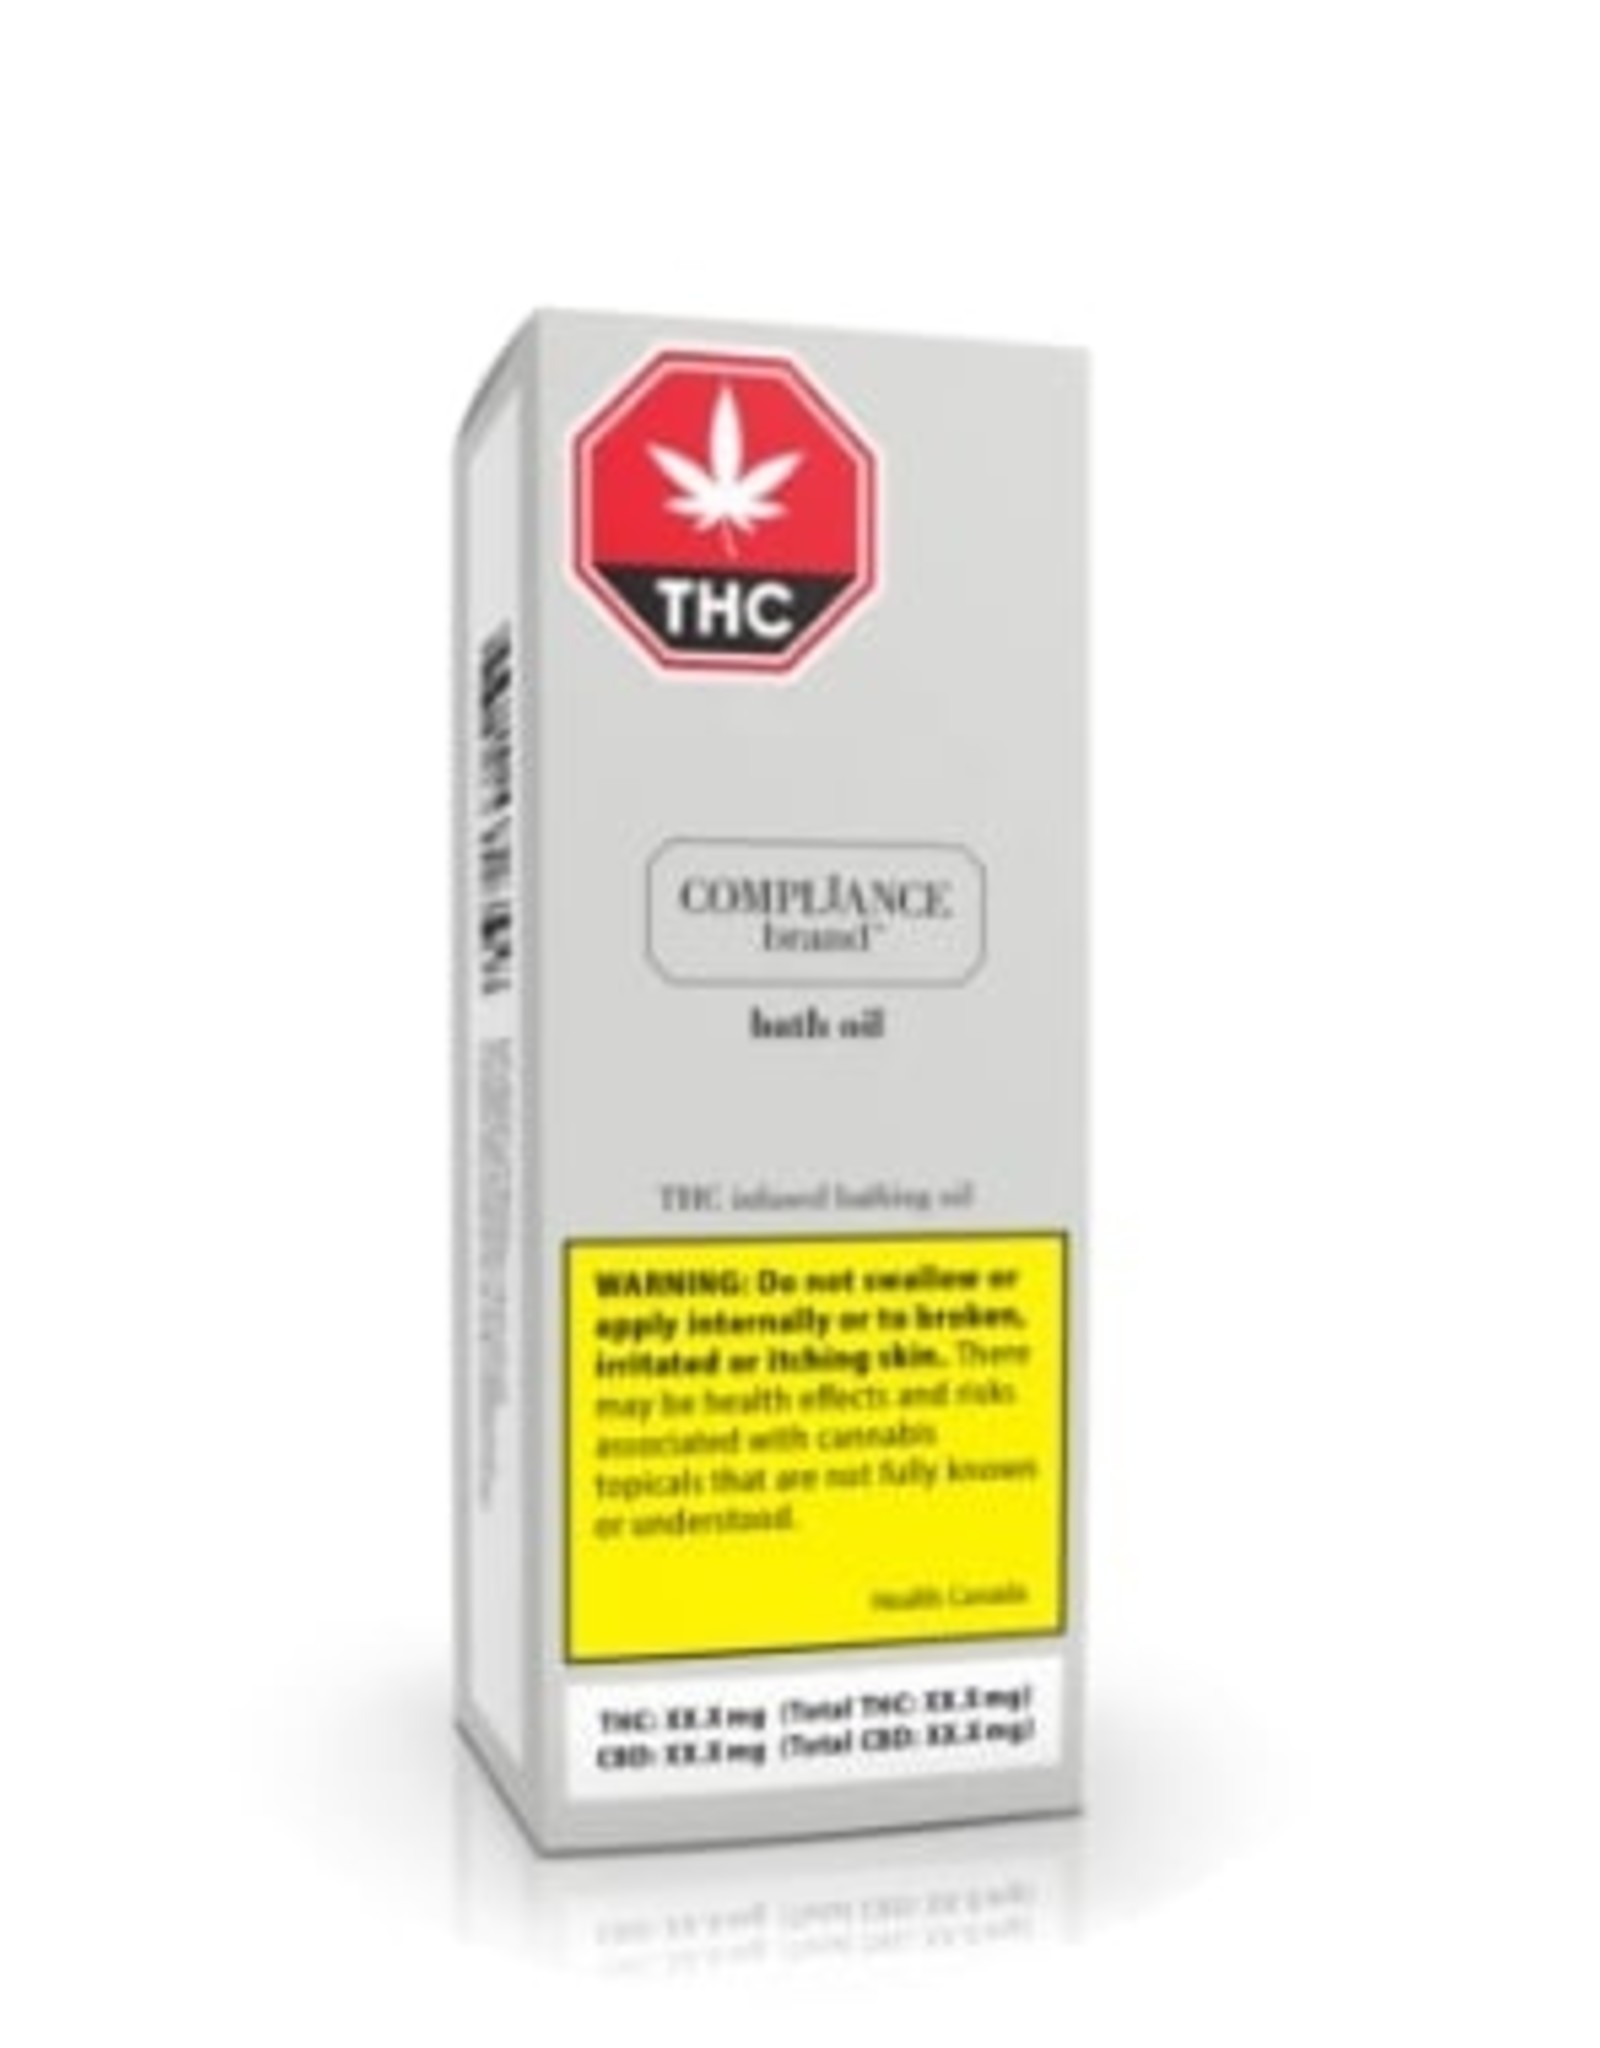 Compliance Compliance - Bath Oil - 53.2G